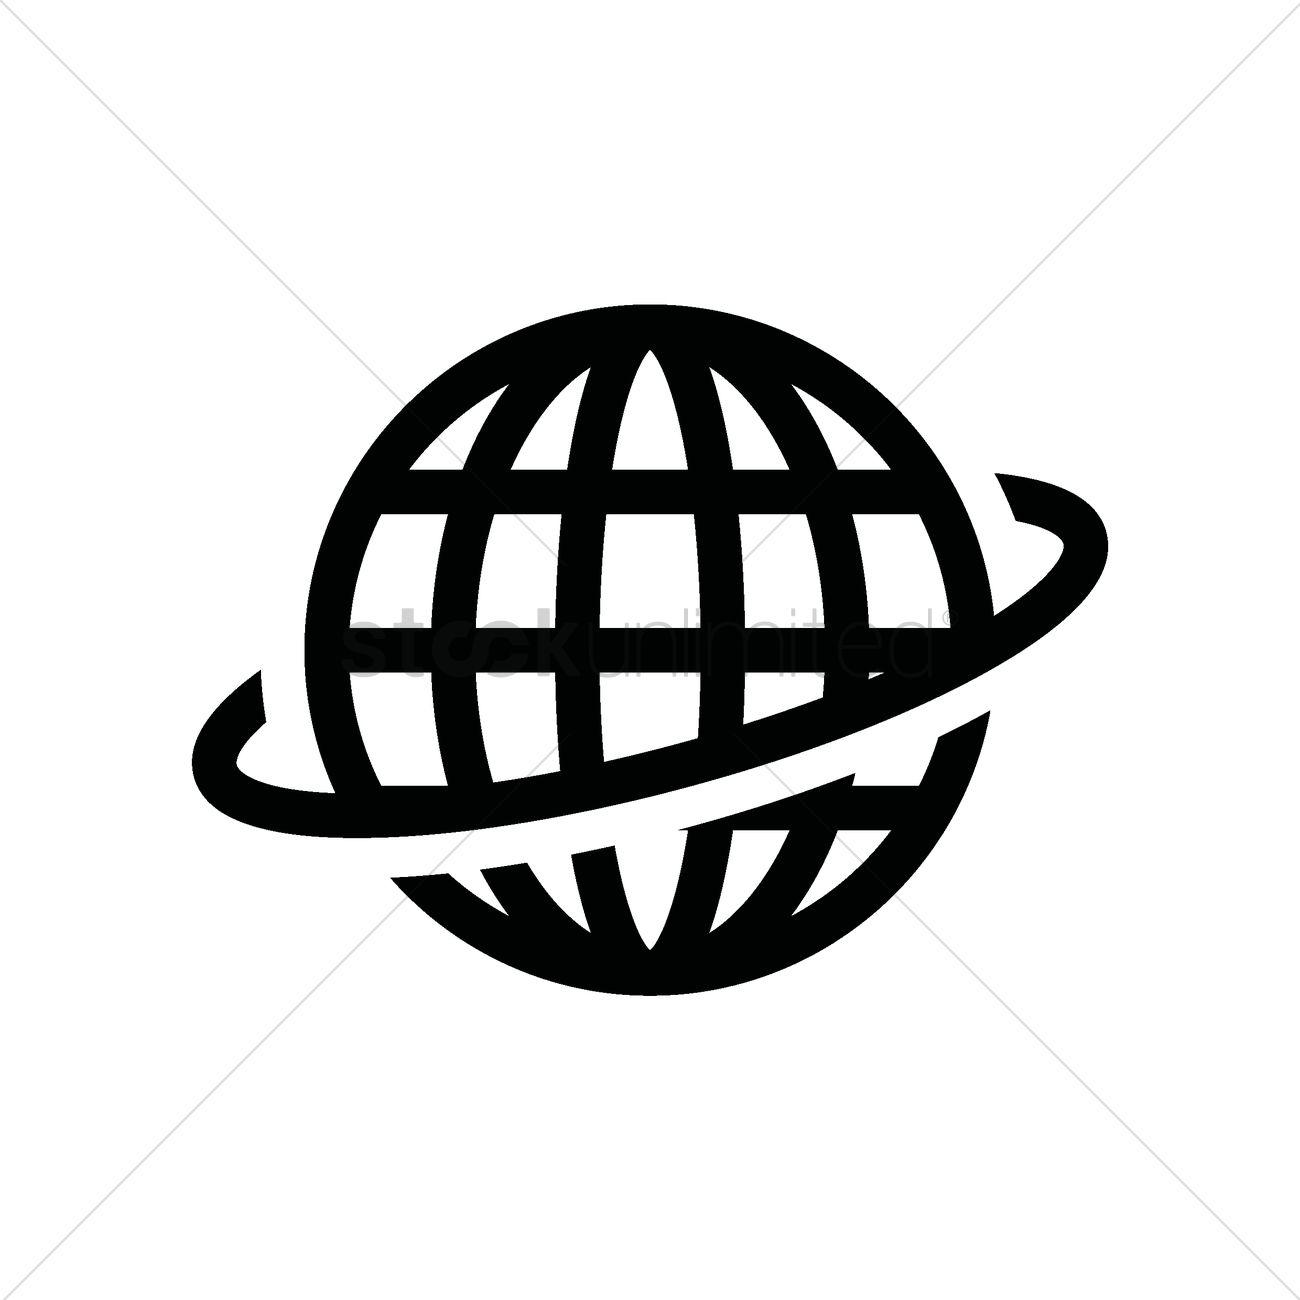 Icon icons symbol symbols interface interfaces global worldwide globe icon stock vector publicscrutiny Choice Image